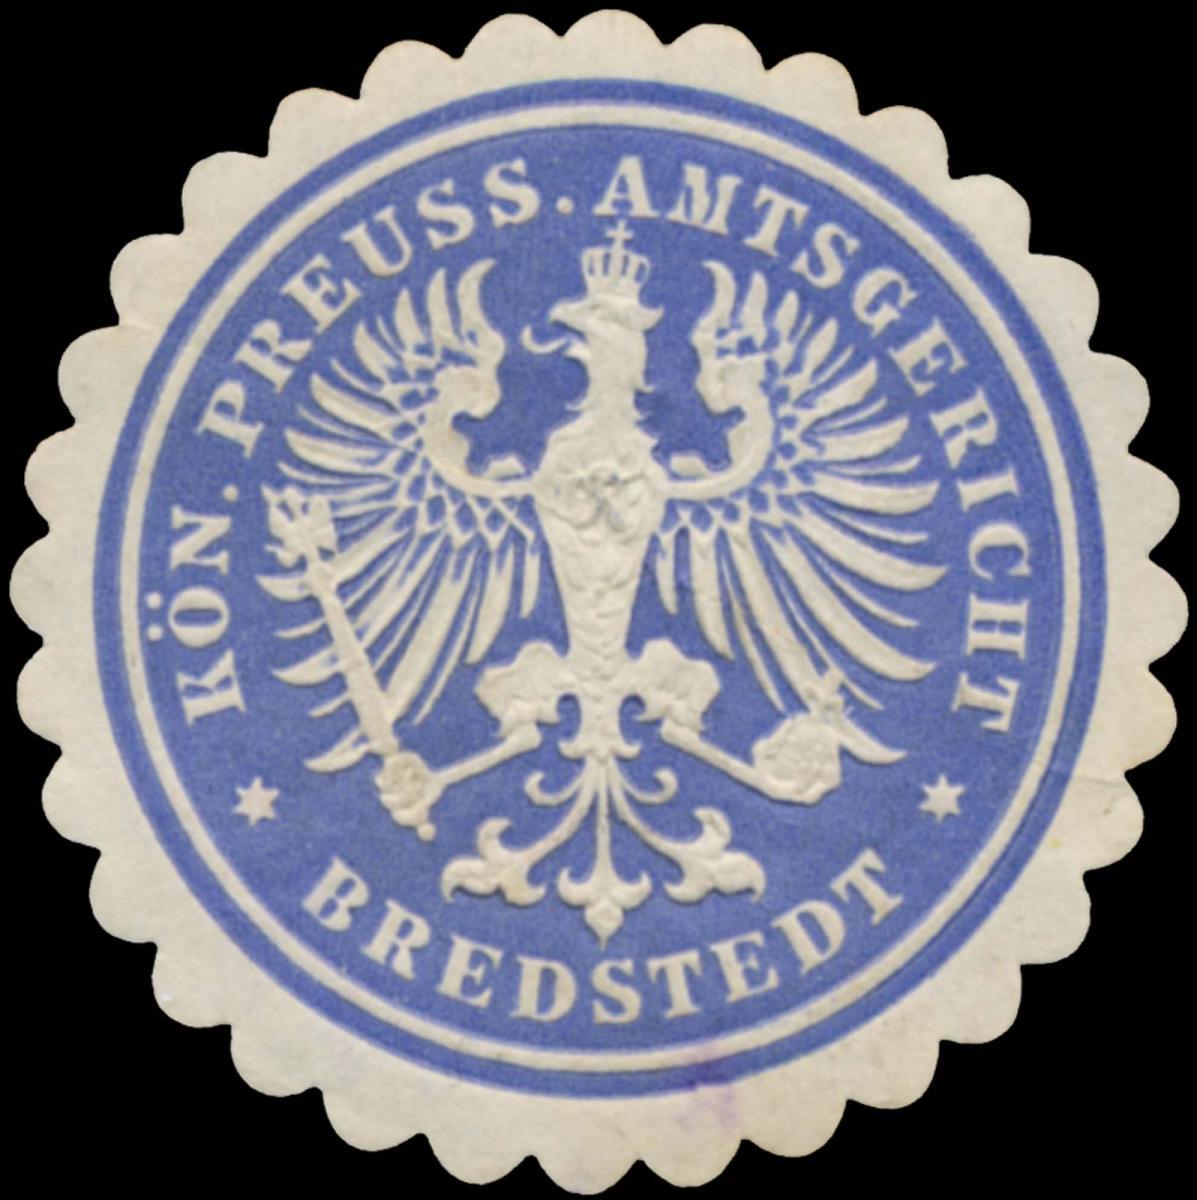 K.Pr. Amtsgericht Bredstedt